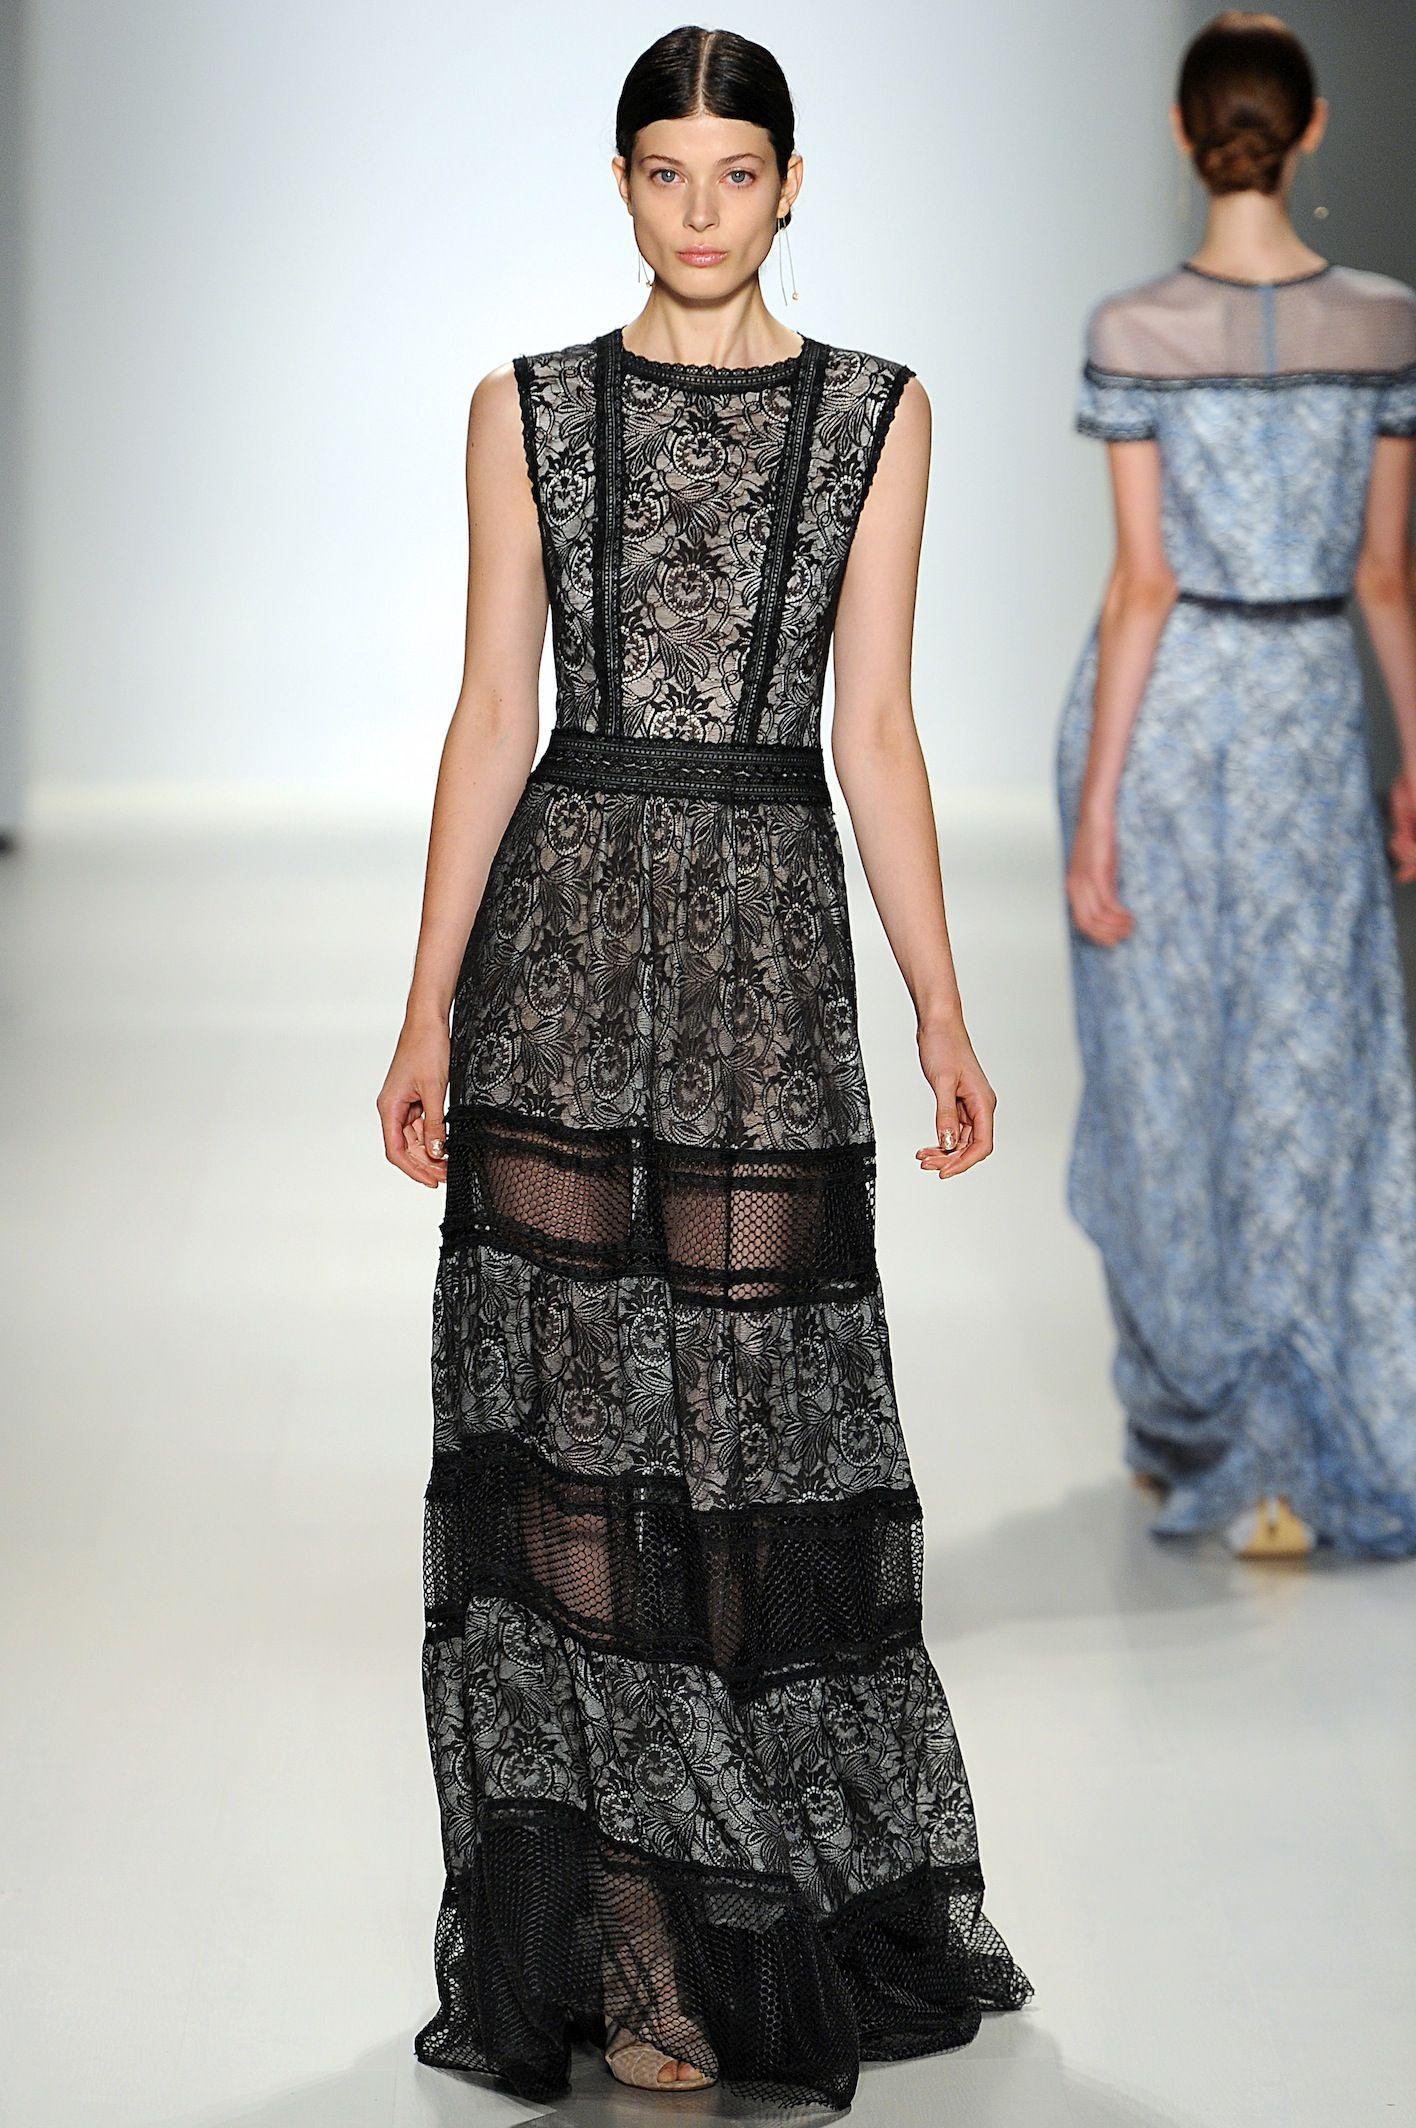 Tadashi Shoji SpringSummer 2014 RTW – New York Fashion Week Tadashi Shoji SpringSummer 2014 RTW – New York Fashion Week new picture